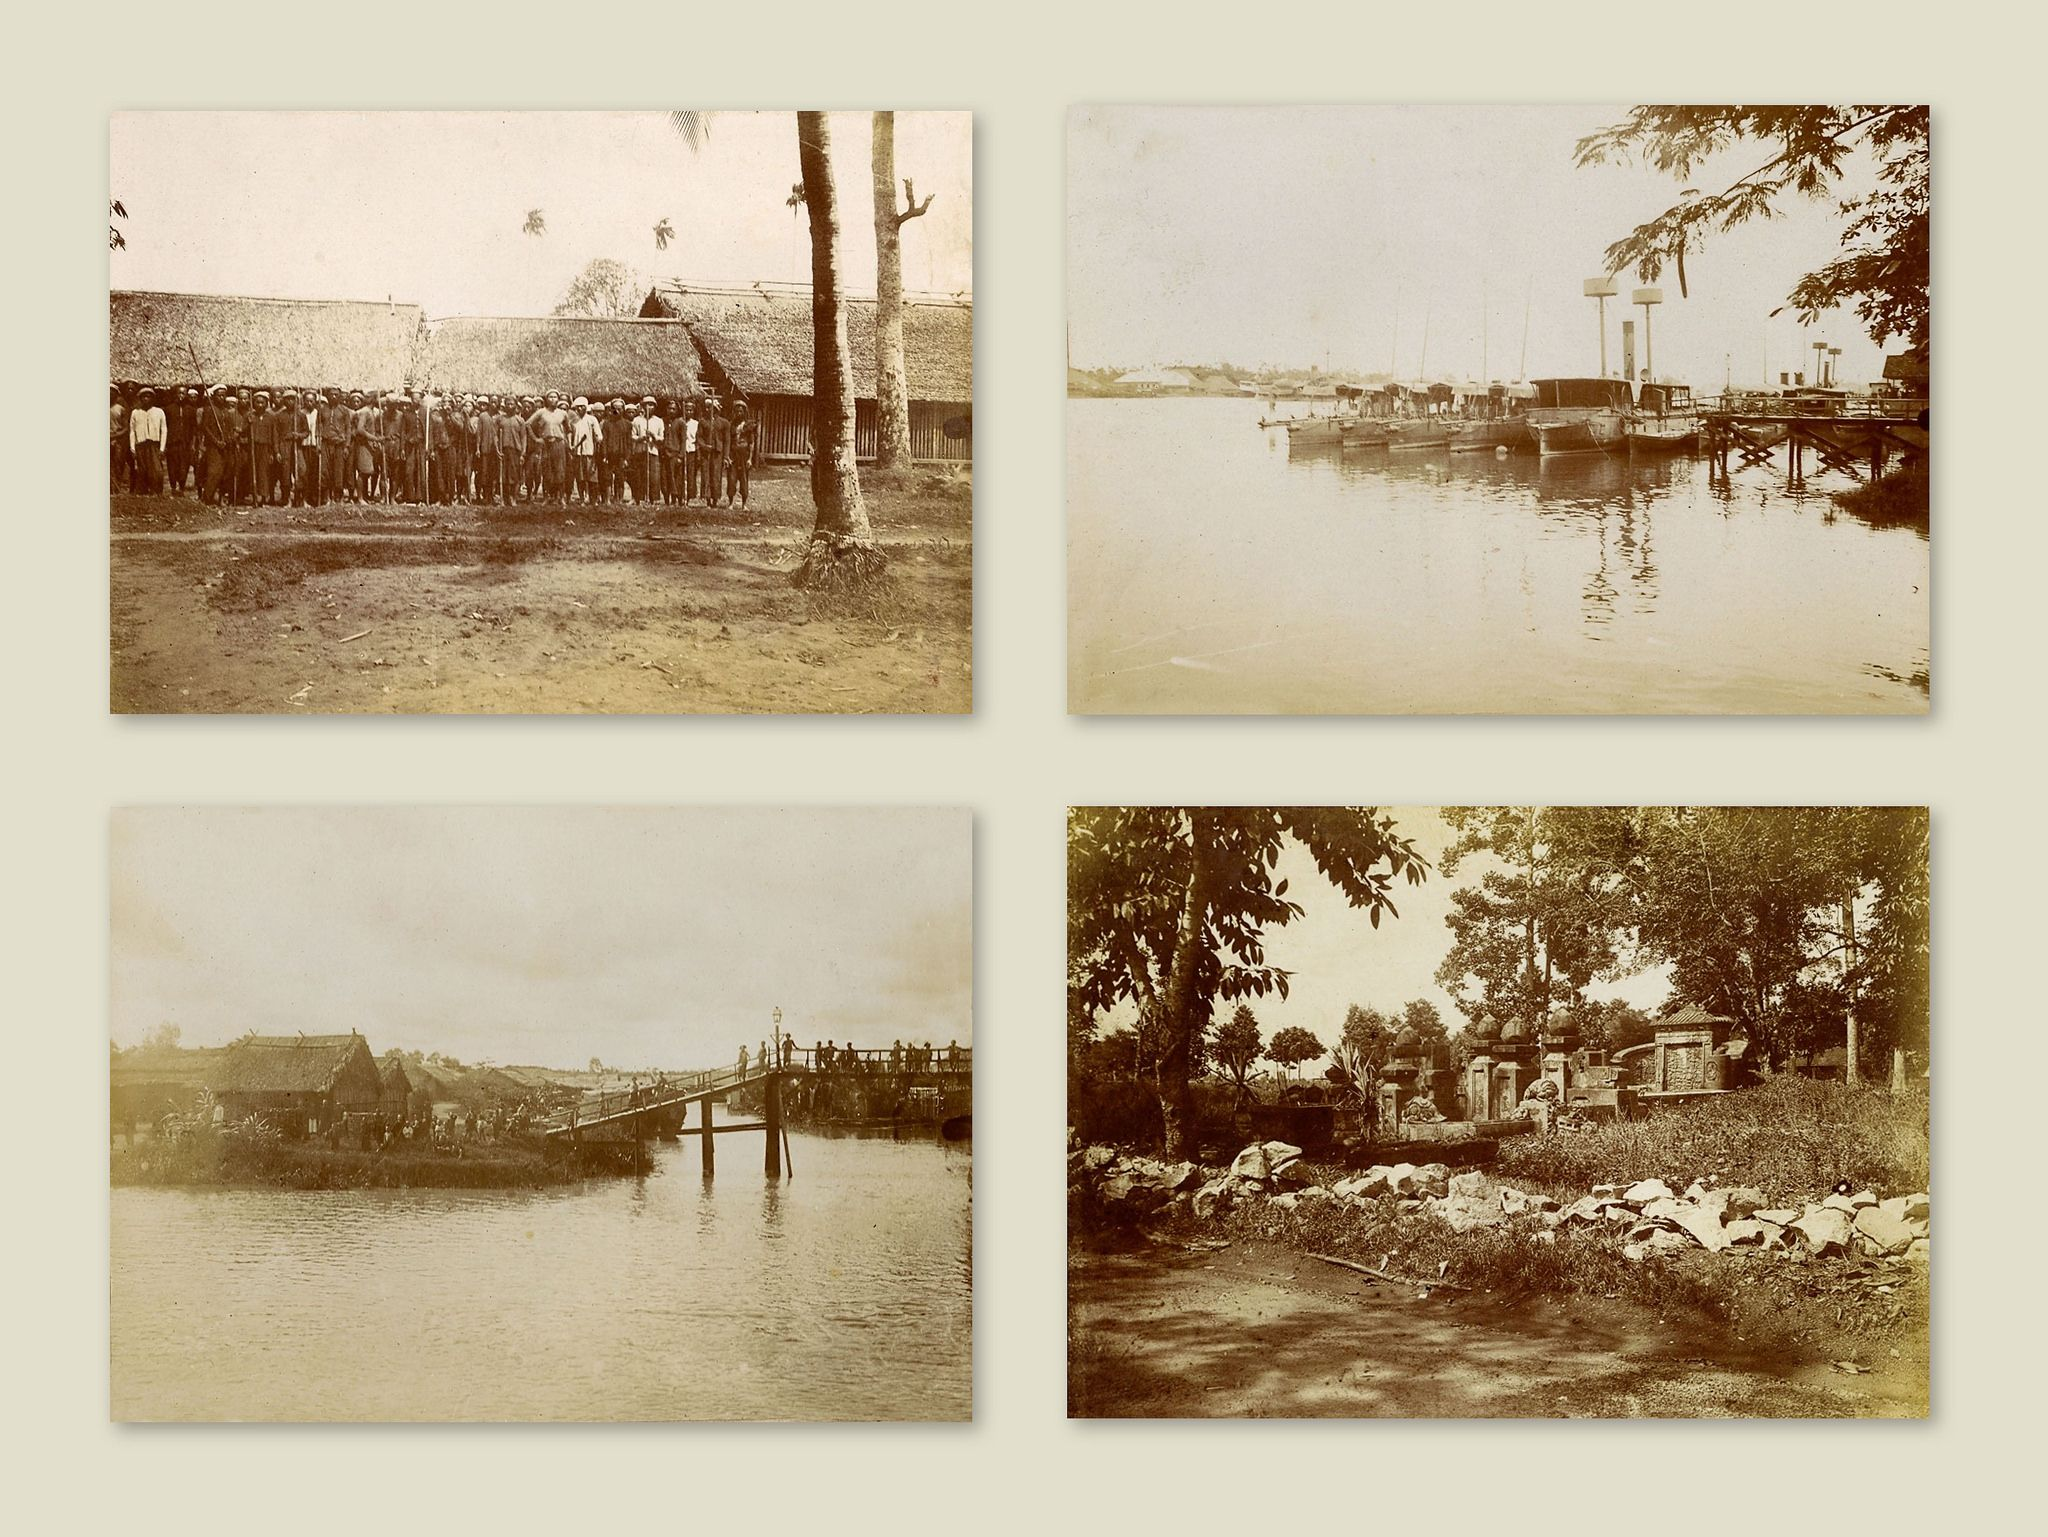 https://flic.kr/p/FyBAZi | NAM KỲ XƯA - Cochinchine 1898-1905 (5)